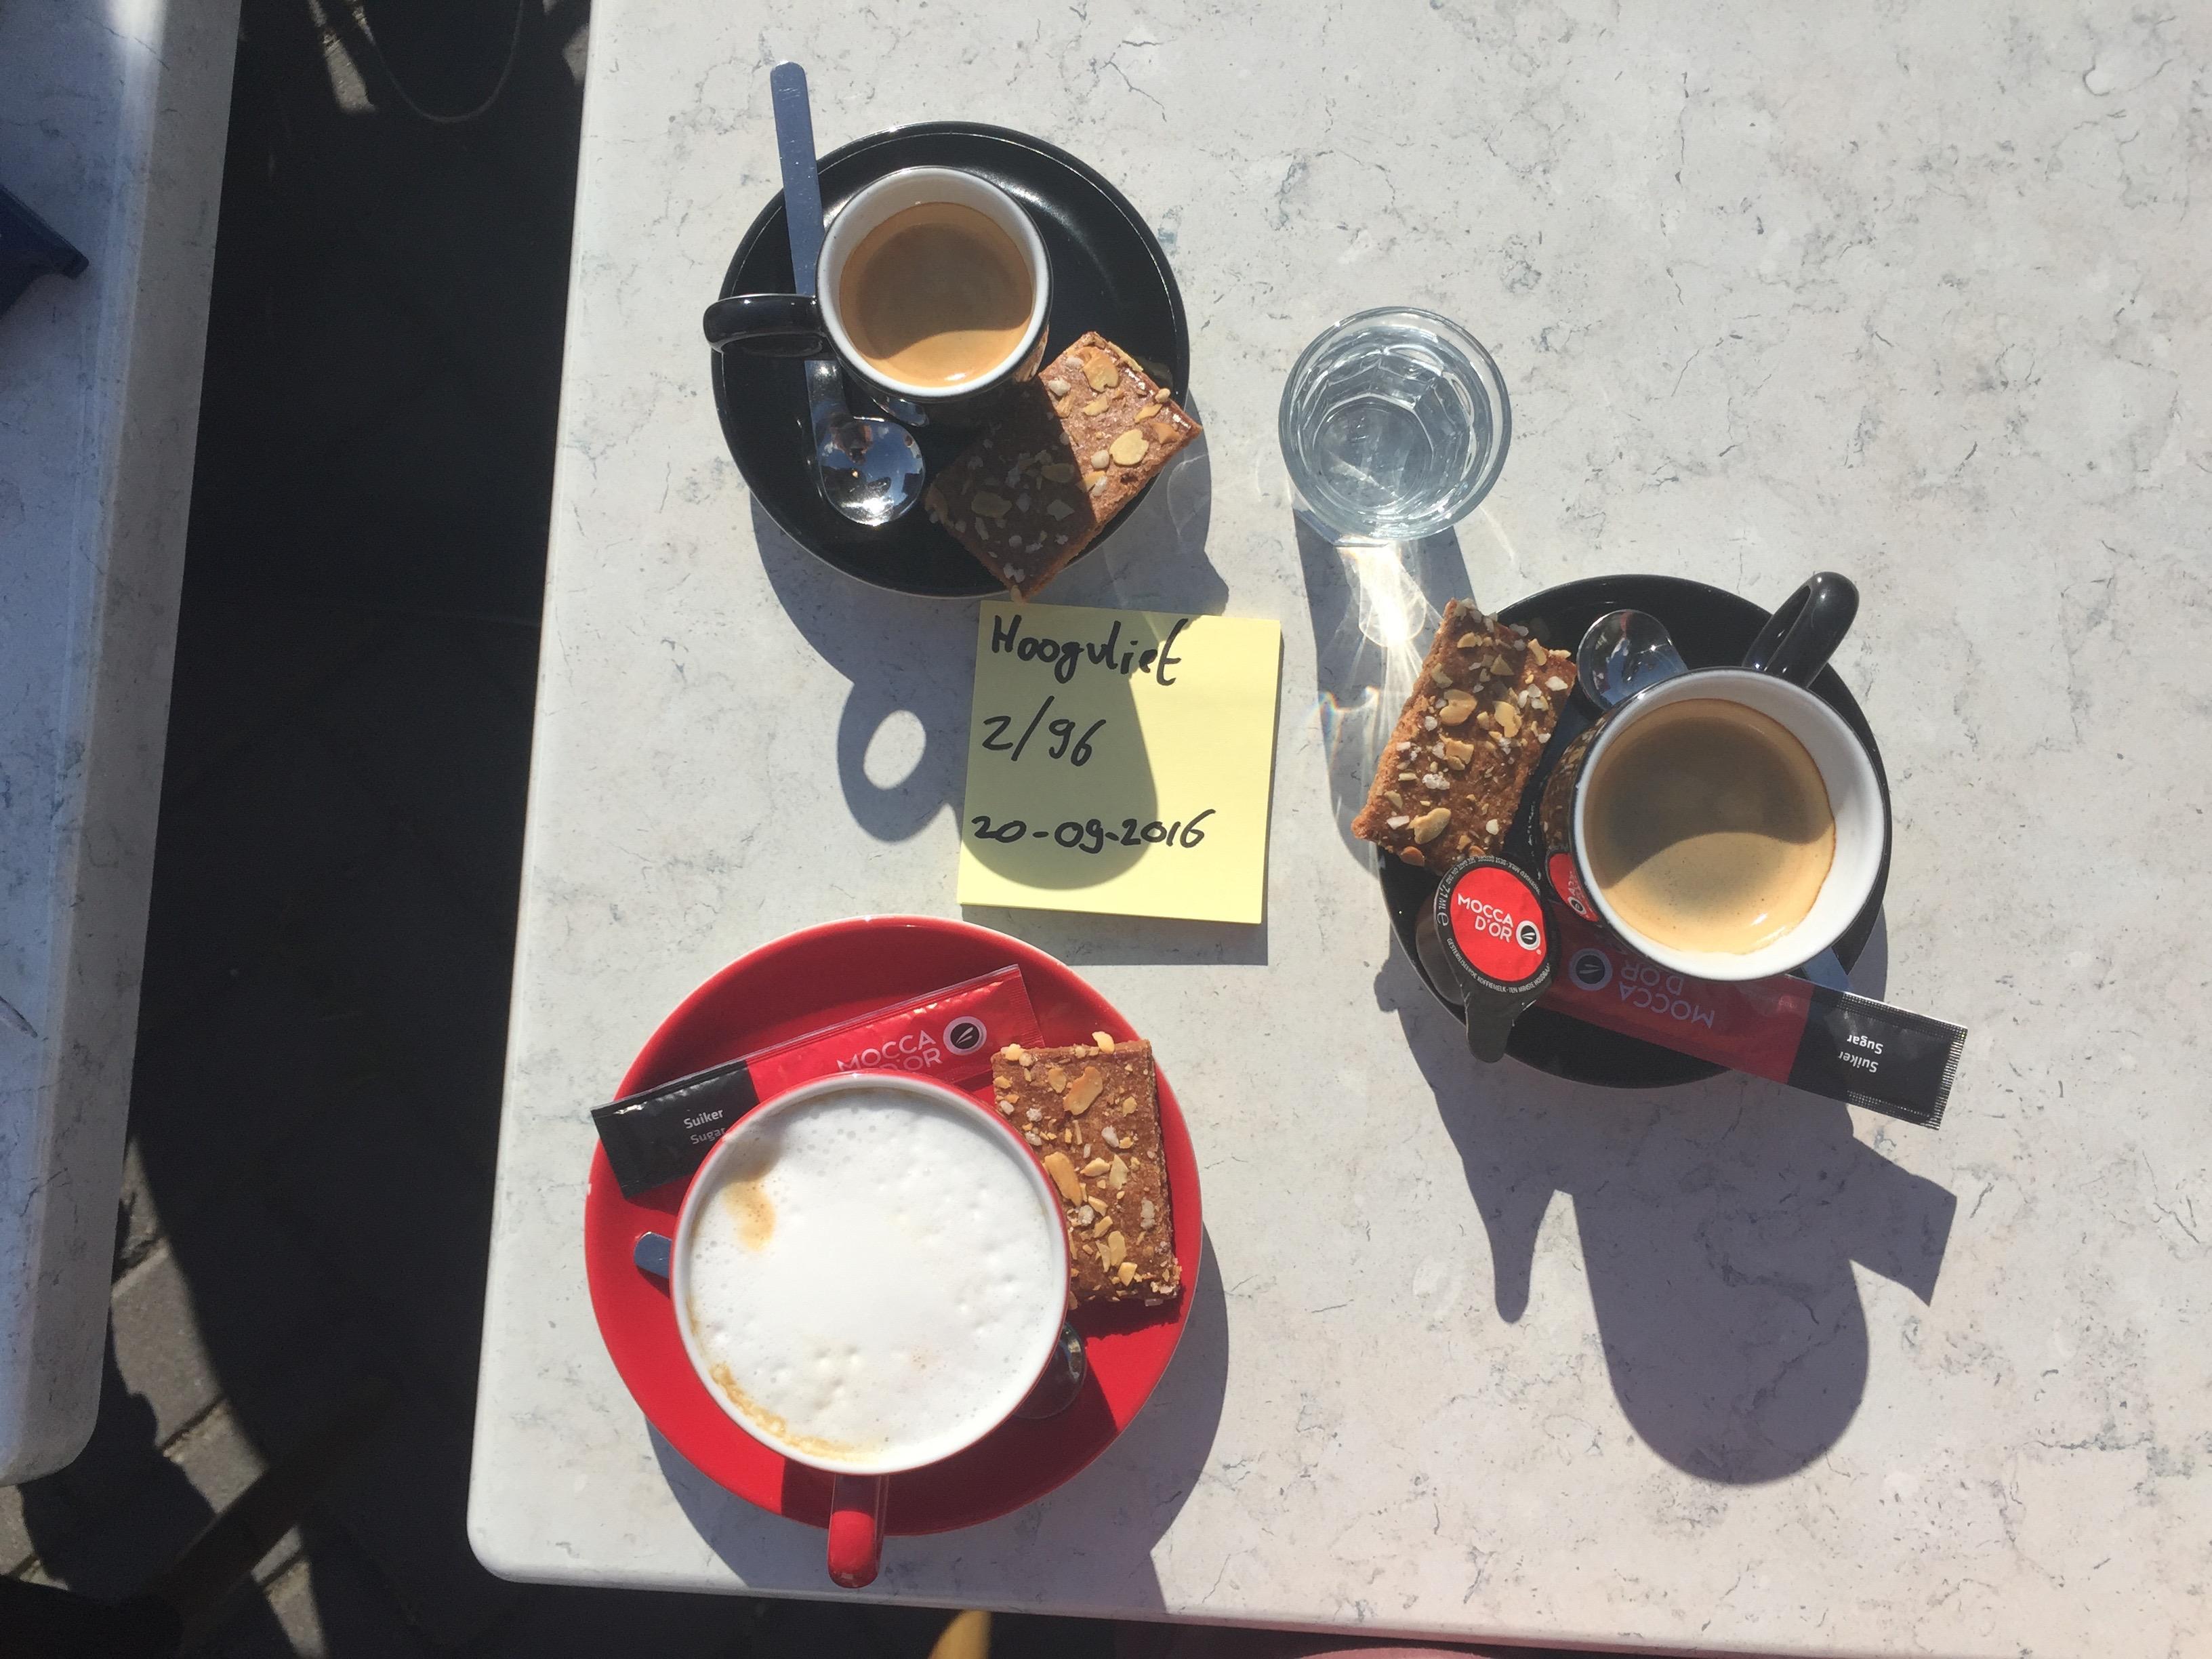 Croissanterie het Tramhuis